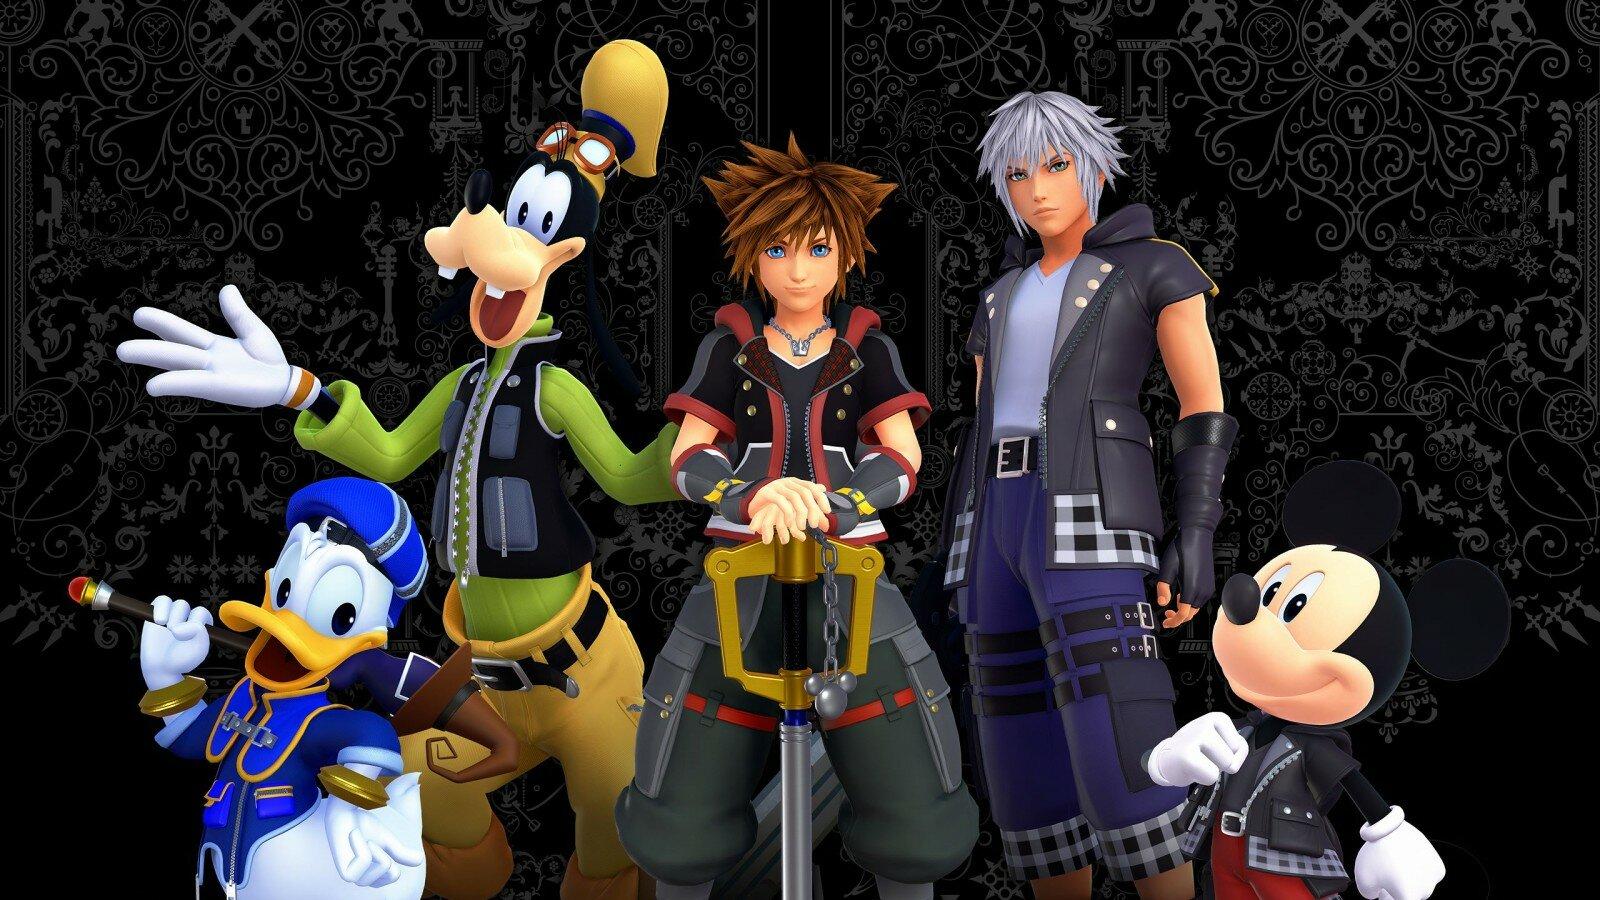 Kingdom Hearts 3 4k 1543039 Hd Wallpaper Backgrounds Download